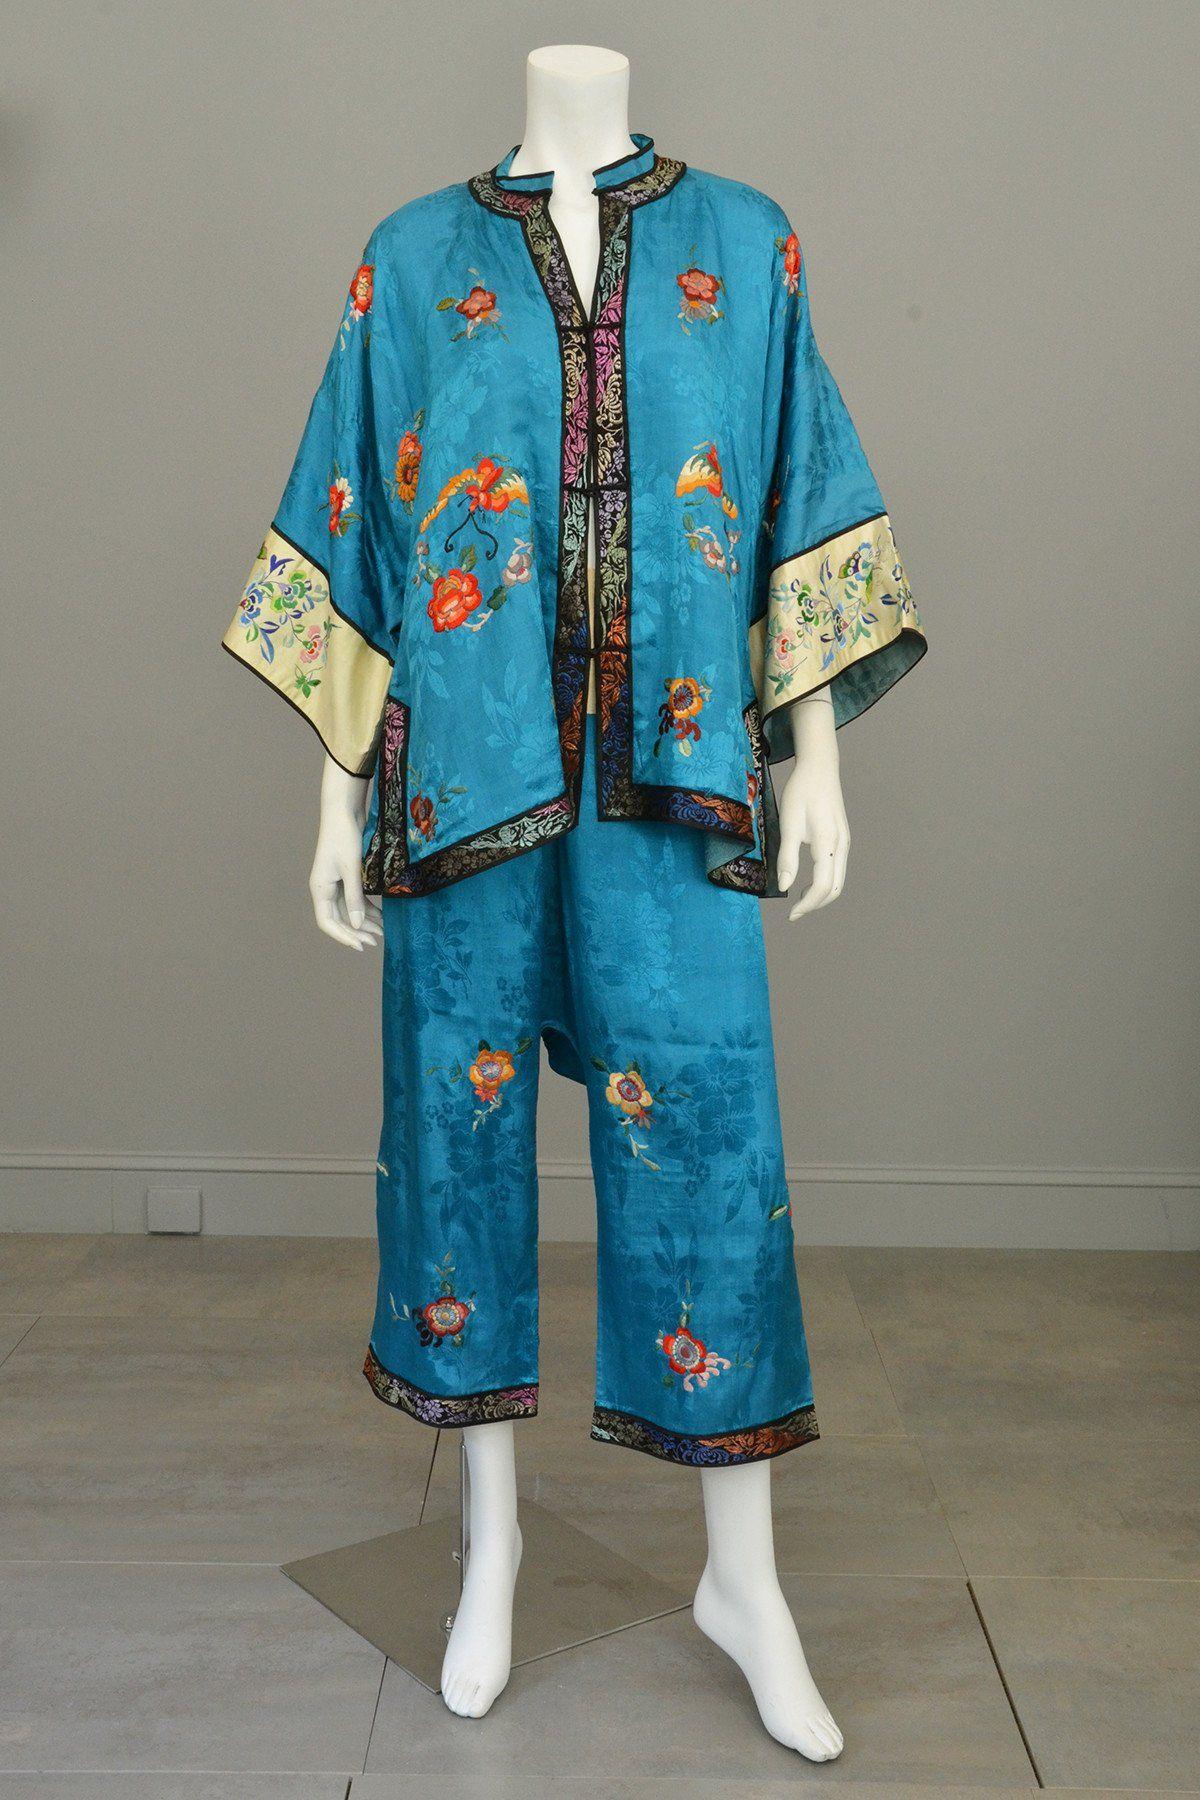 1930s Embroidered Chinese Silk Pajamas Loungewear Beach Pajamas Wide leg  Pants from VintageVirtuosa f85517a64